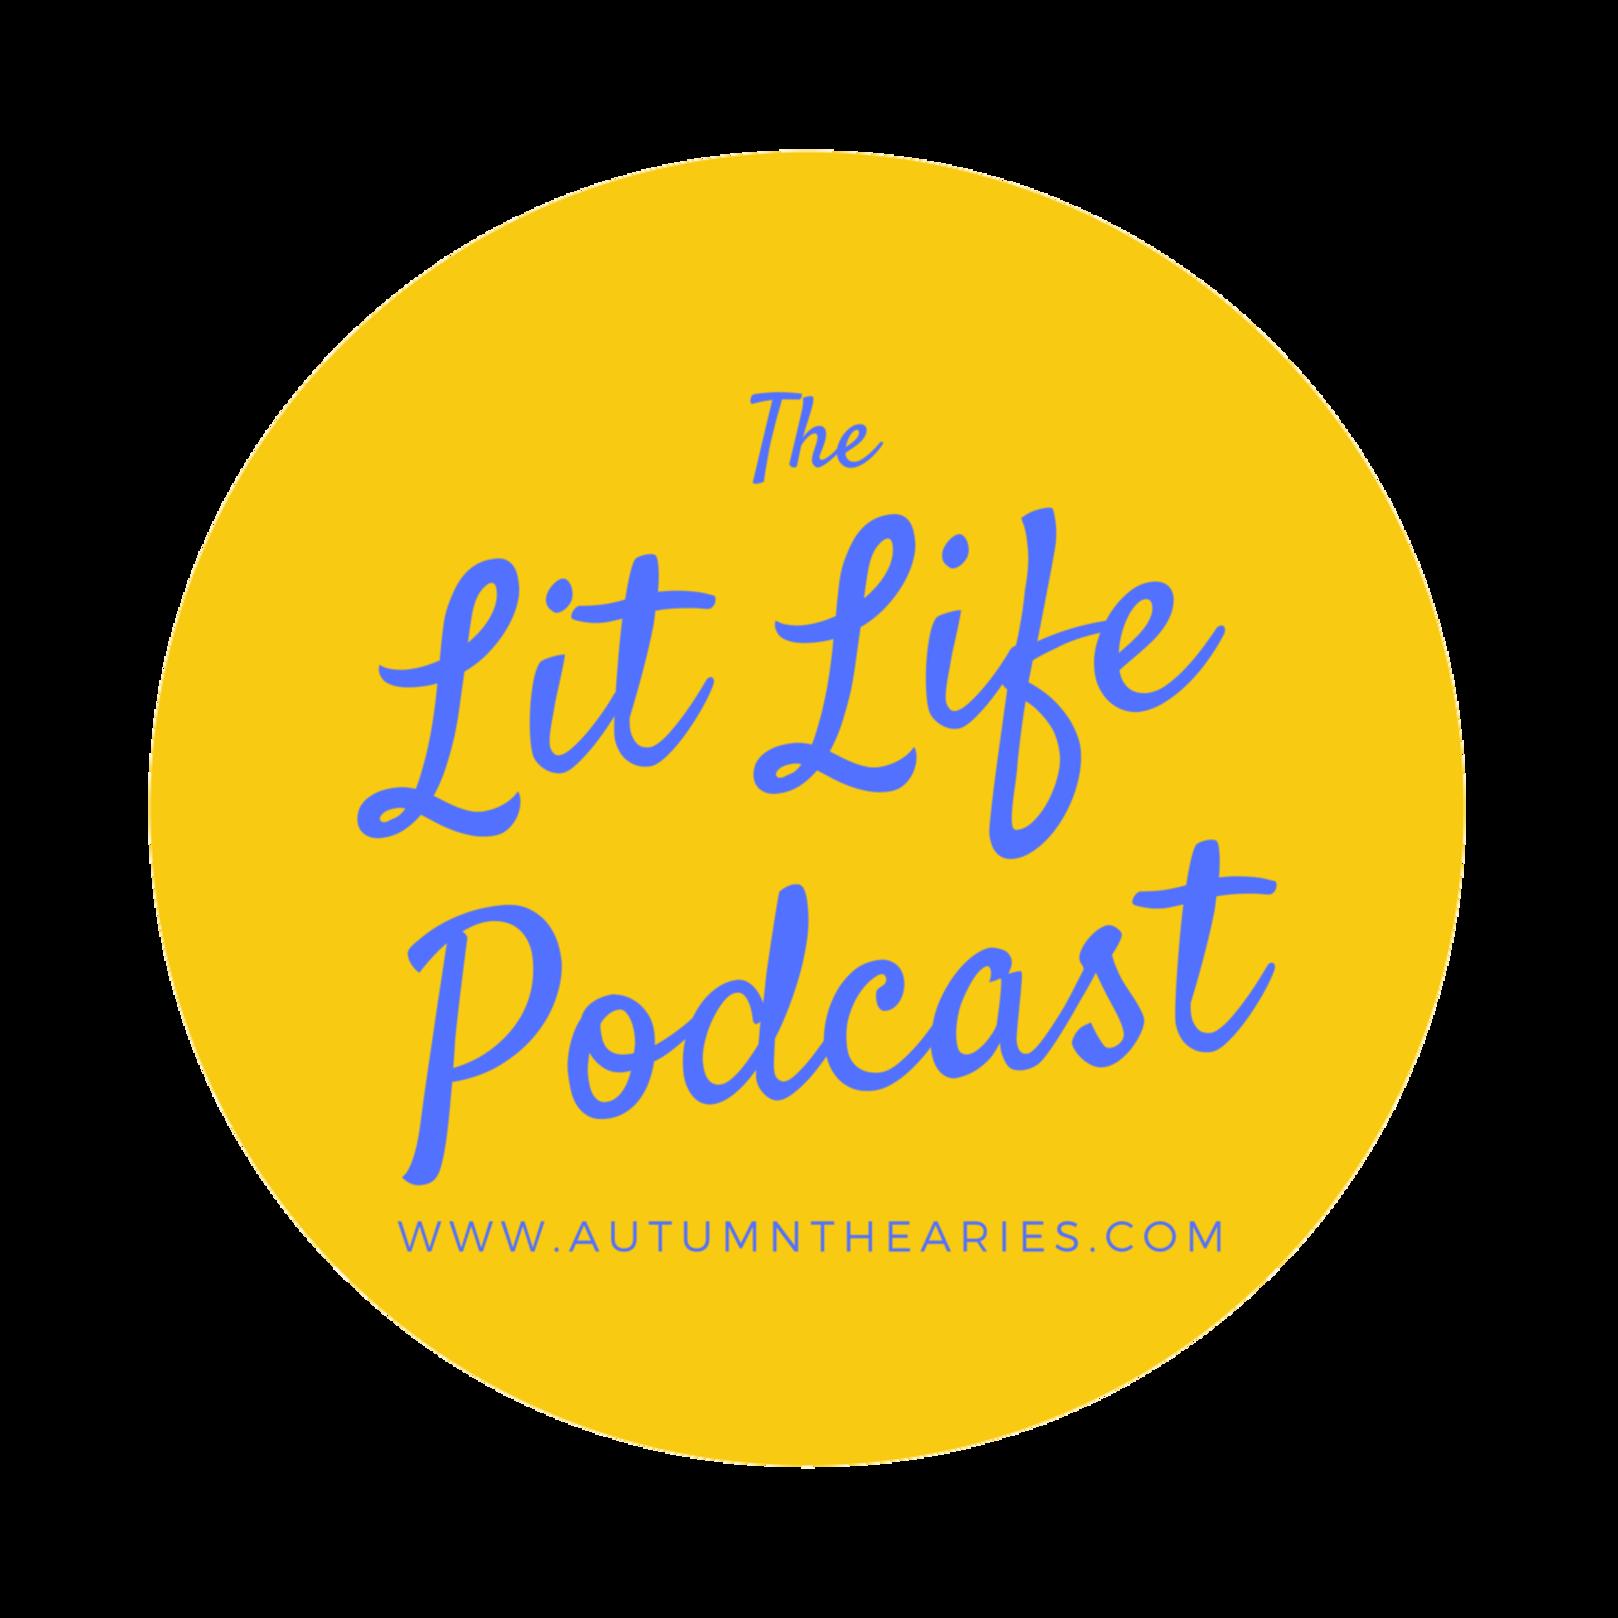 Lit Life Podcast Logo